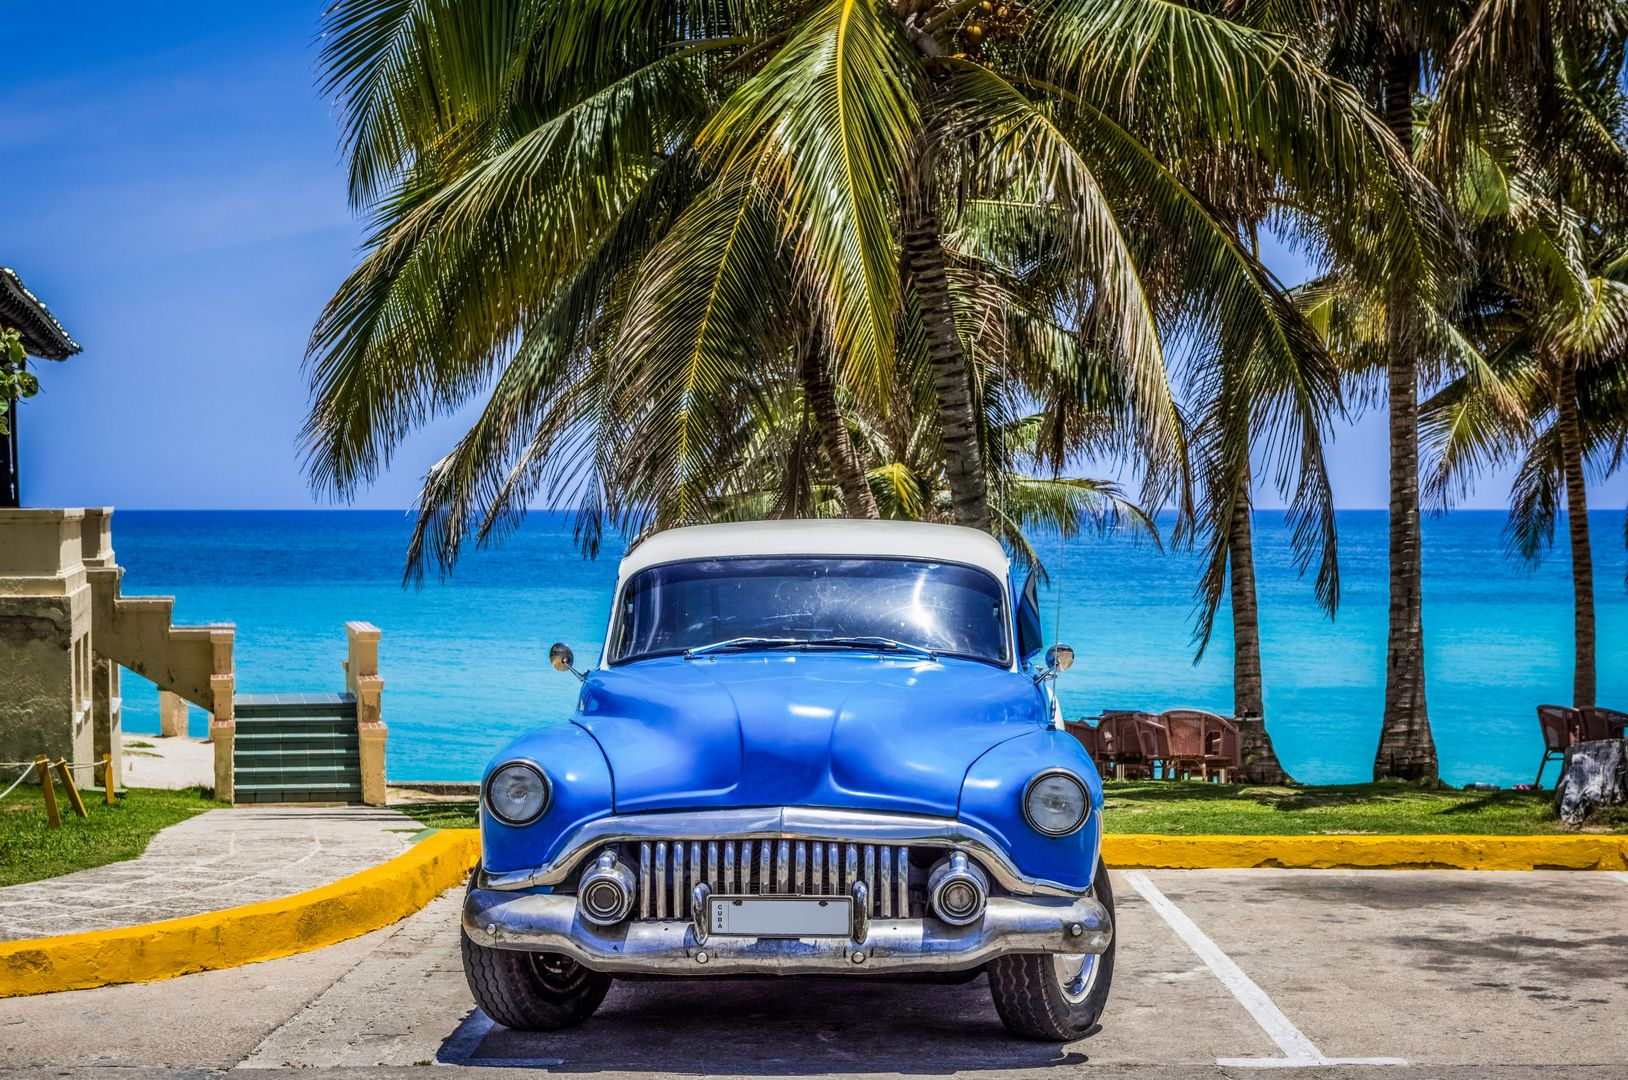 KUBA- RUM, SALSA I CYGARA 4